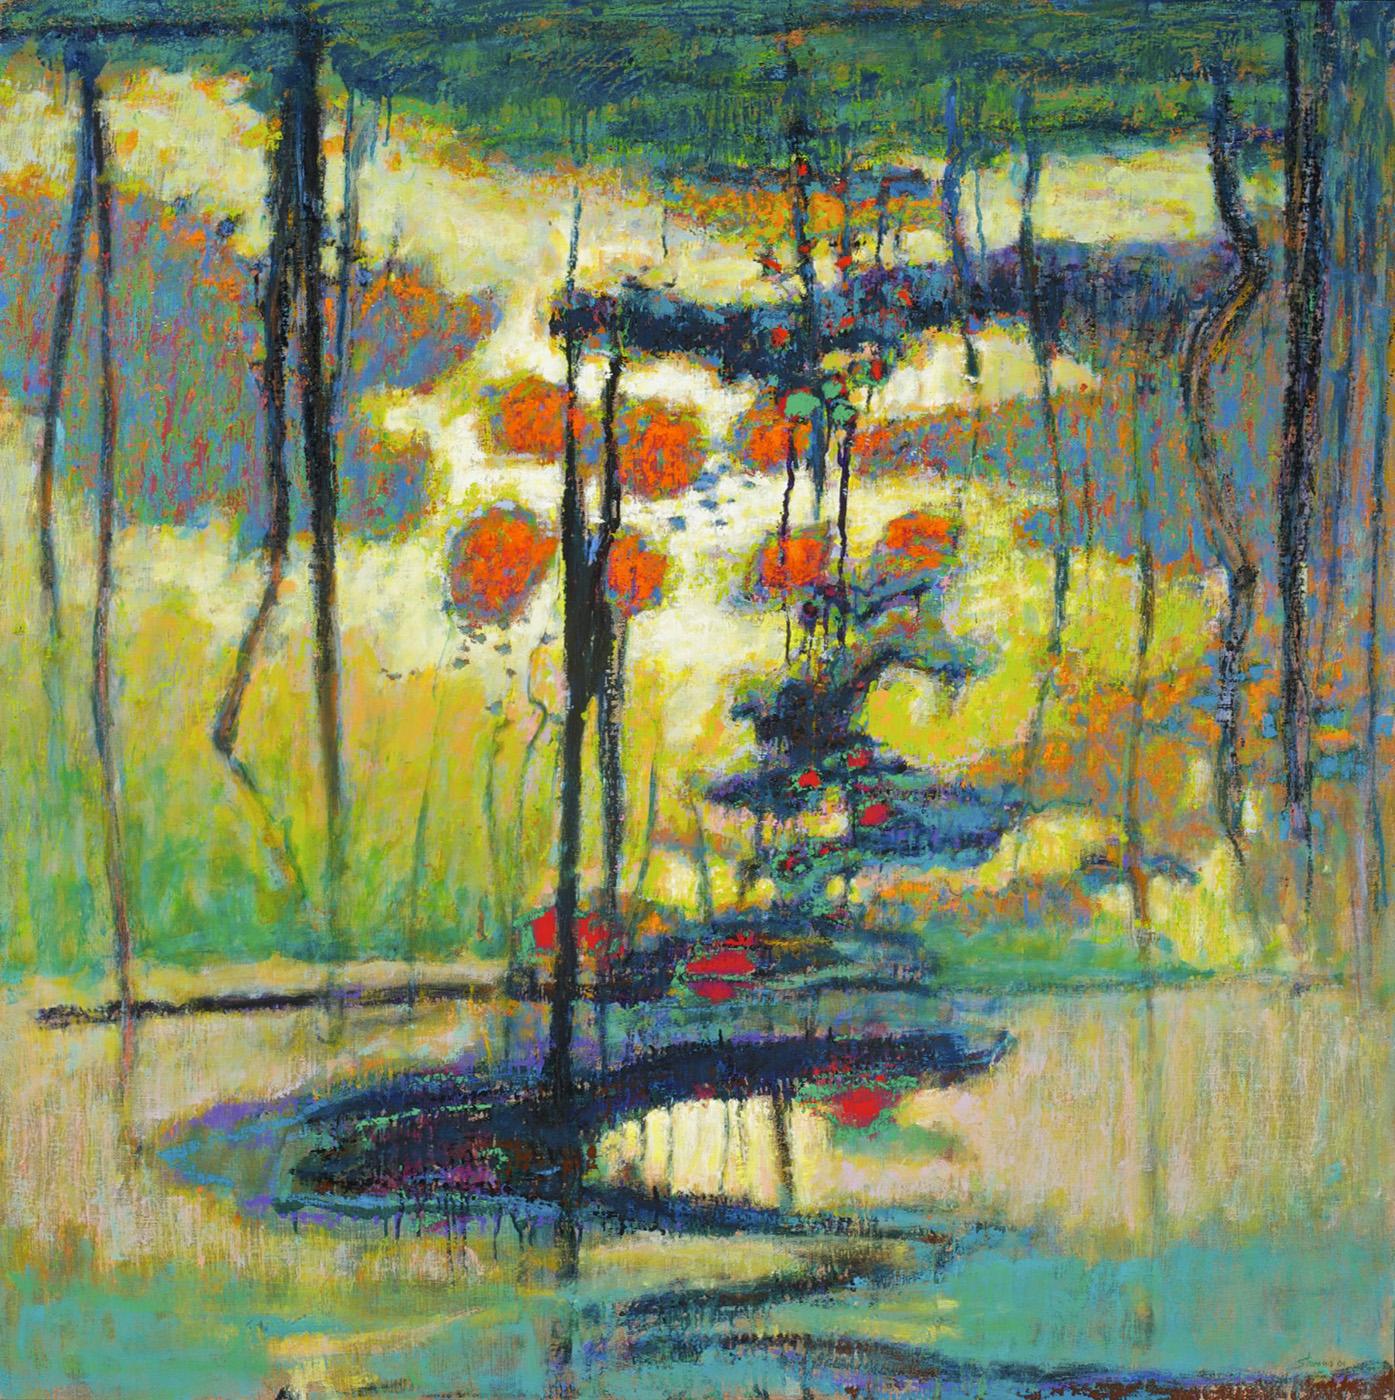 "Revealing Deep Secrets   | oil on canvas | 48 x 48"" | 2009"